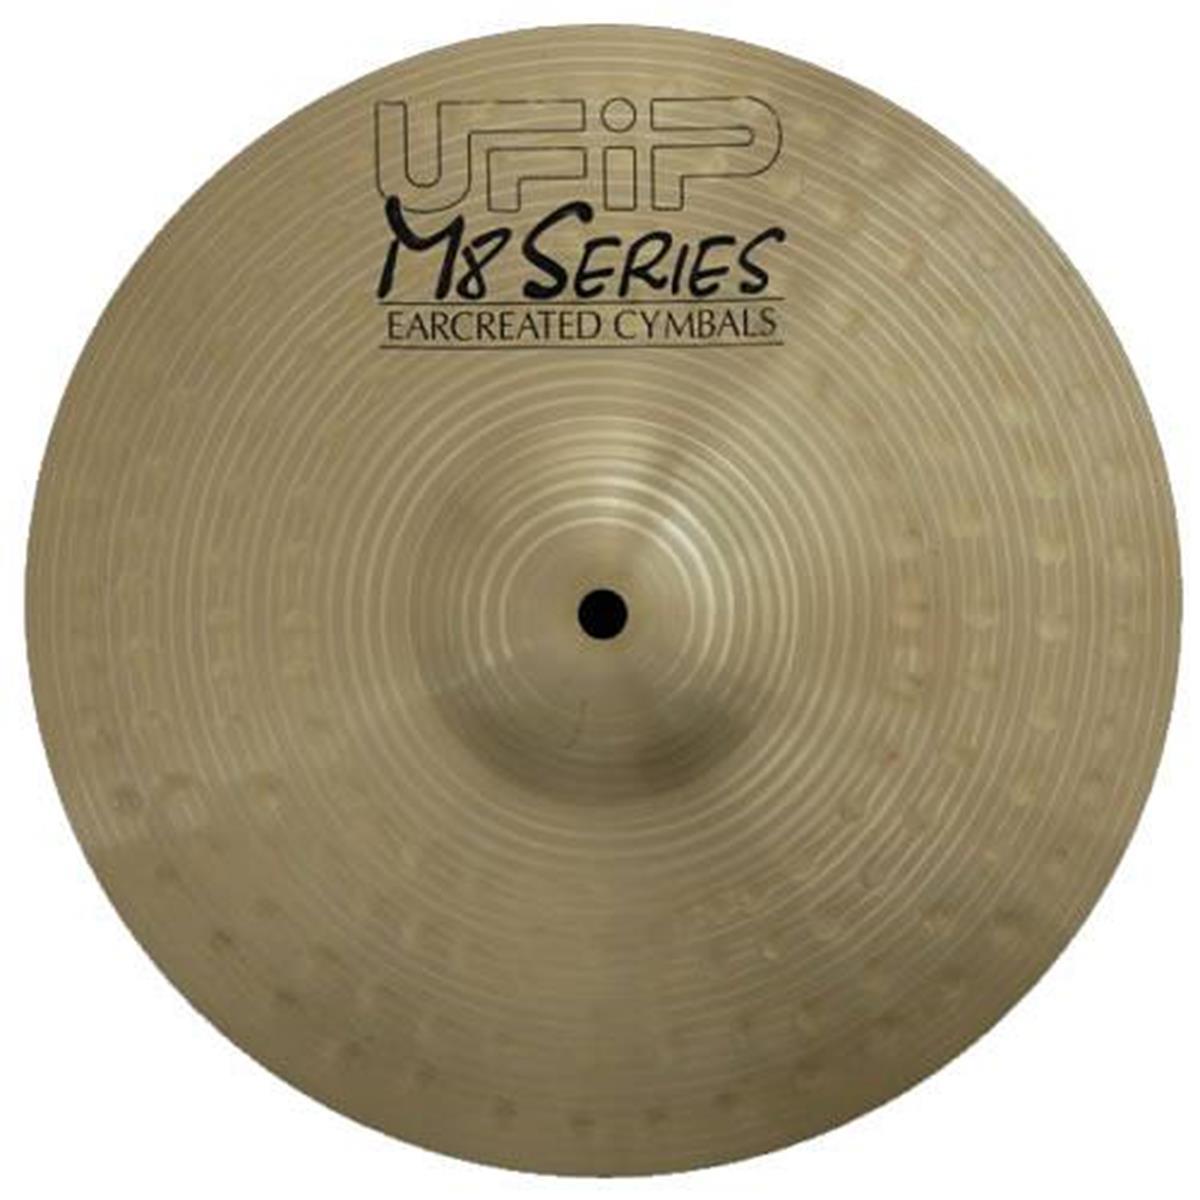 UFIP-M8-12-M8-Series-12-Splash-sku-45600250